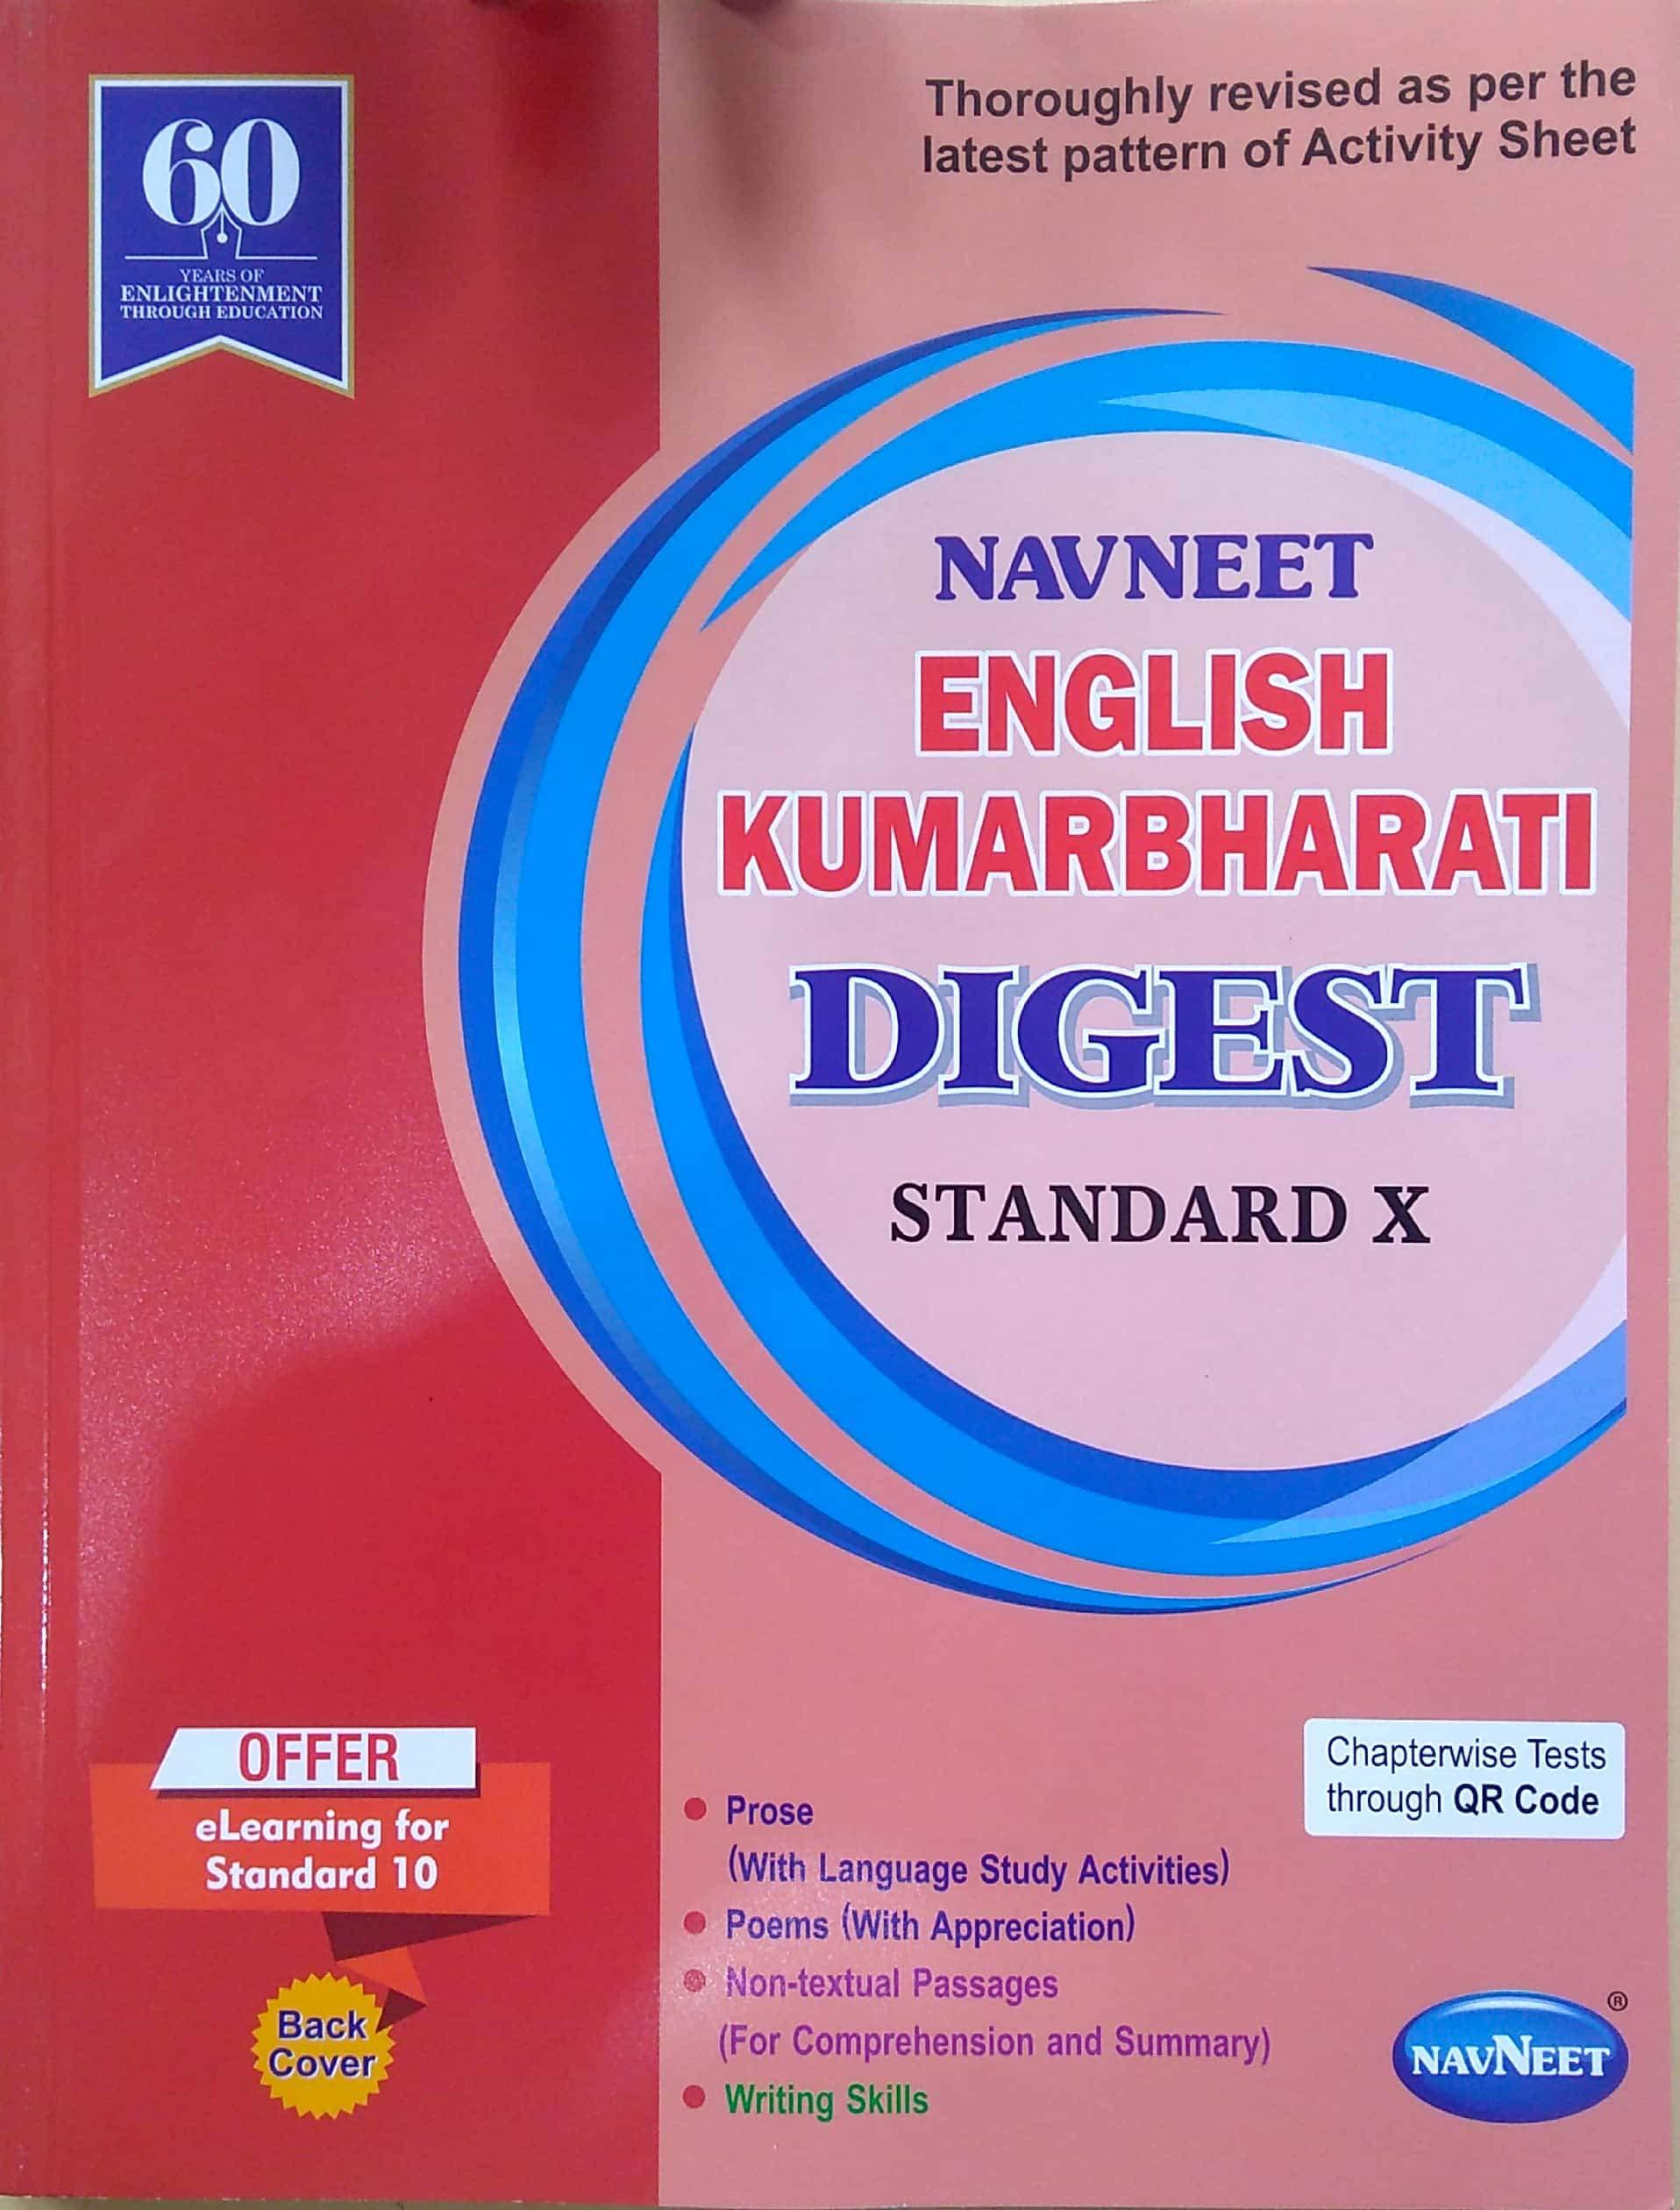 English Kumar Bharti Digest Navneet Class 10th New Syllabus